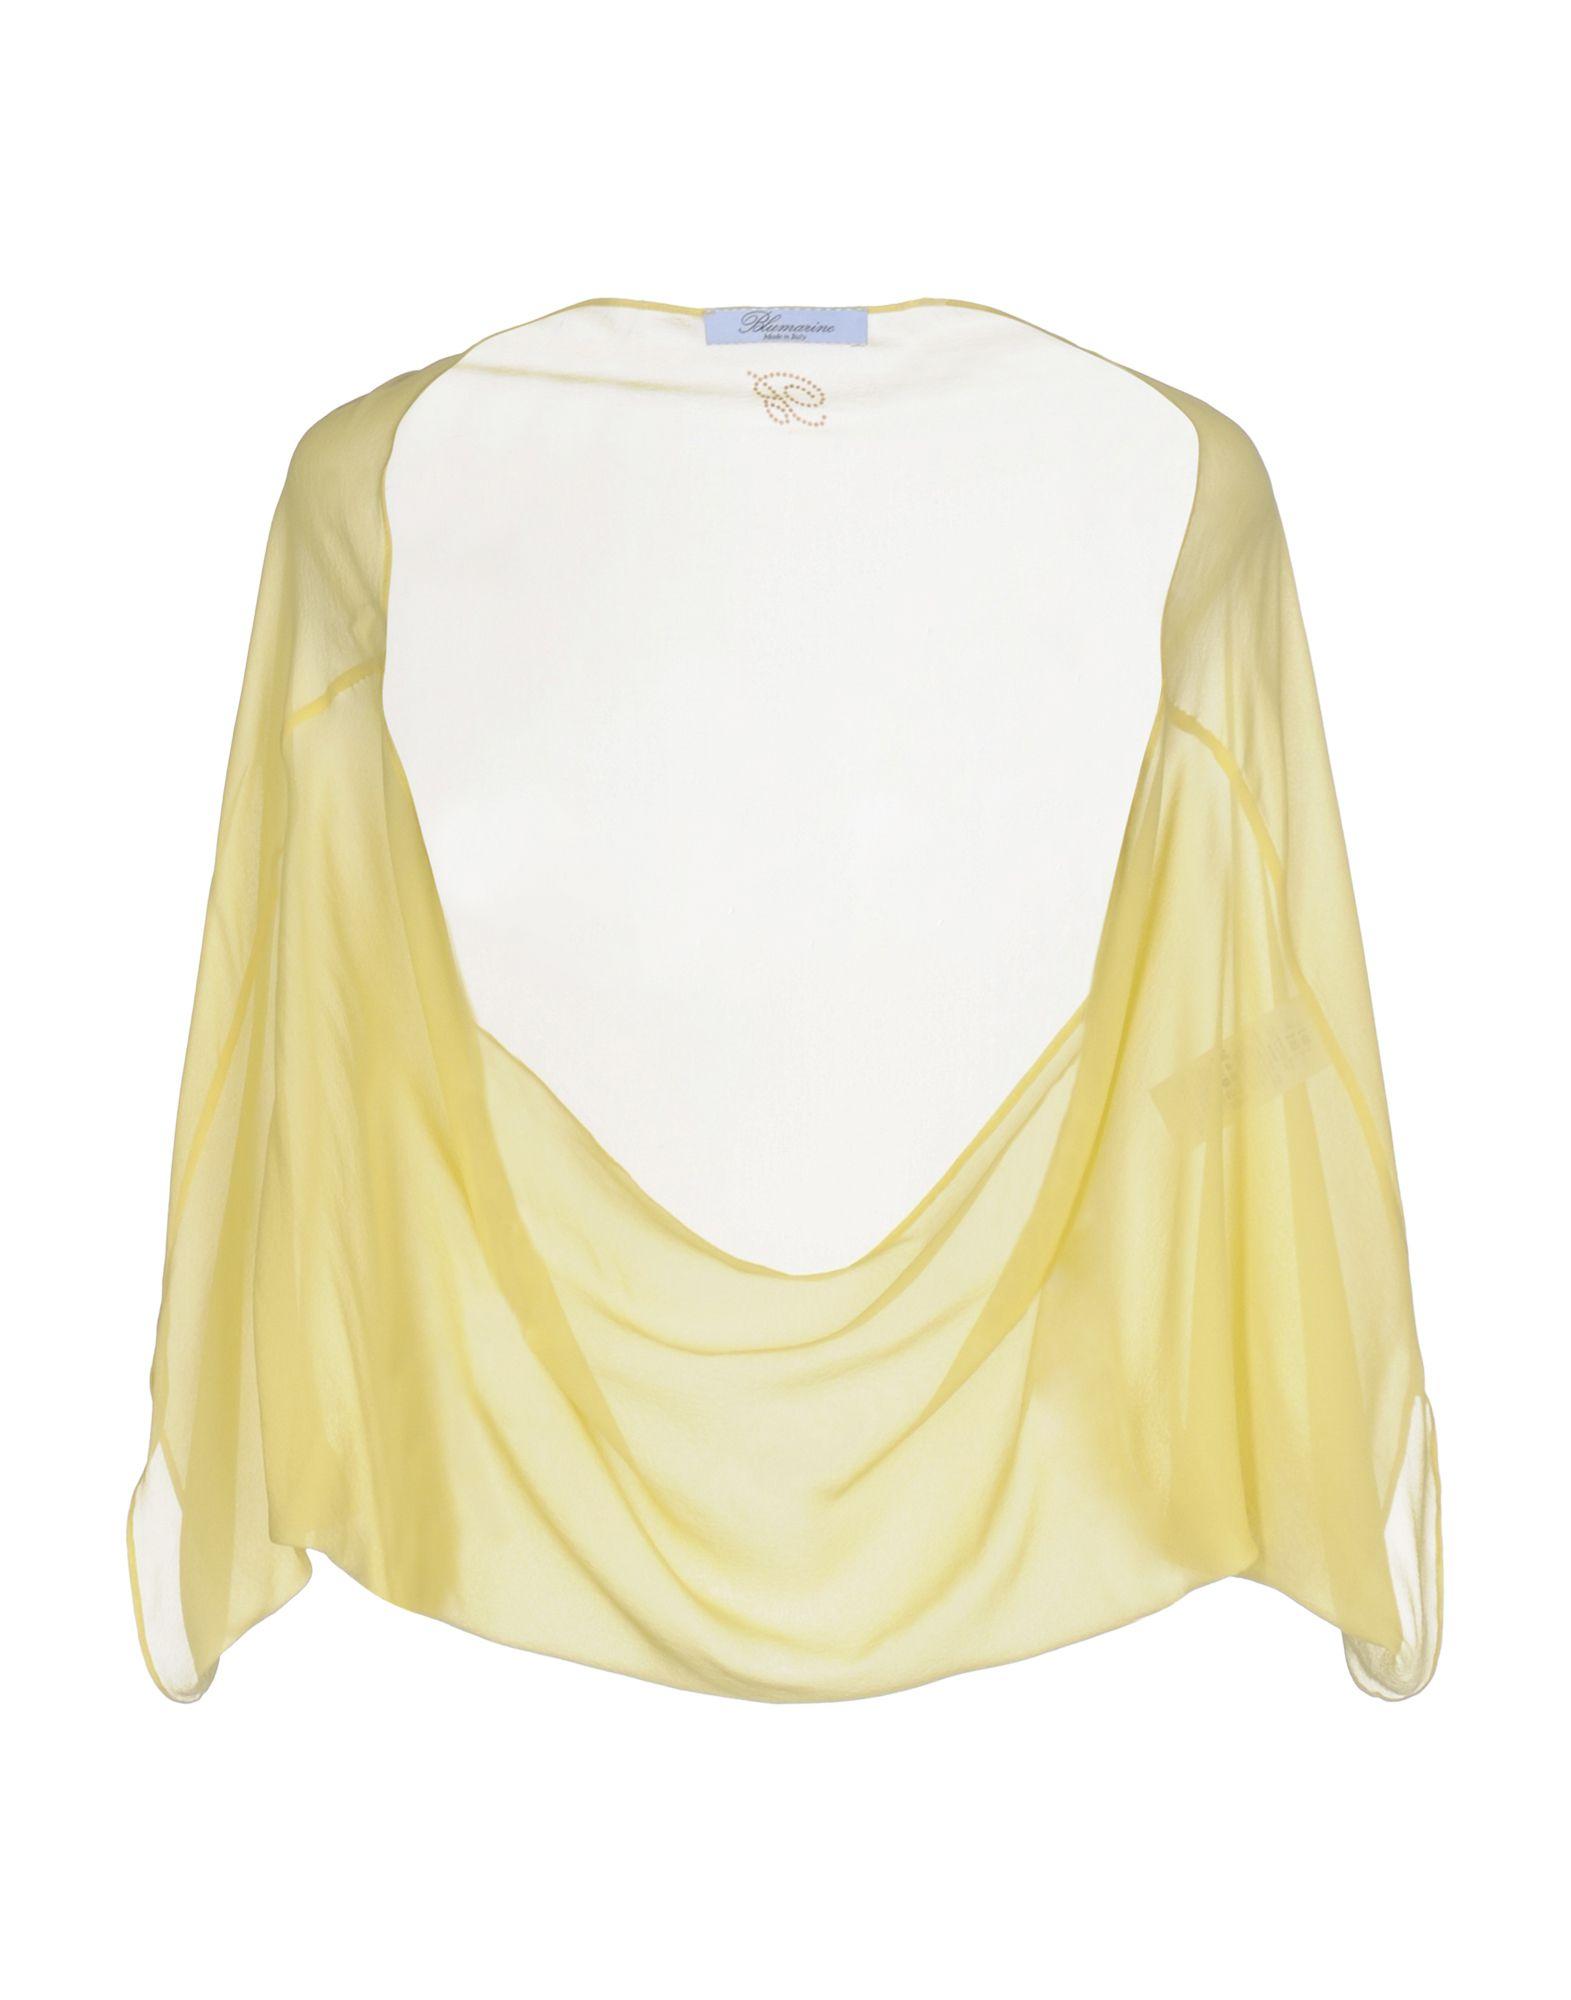 BLUMARINE Damen Bolero Farbe Gelb Größe 7